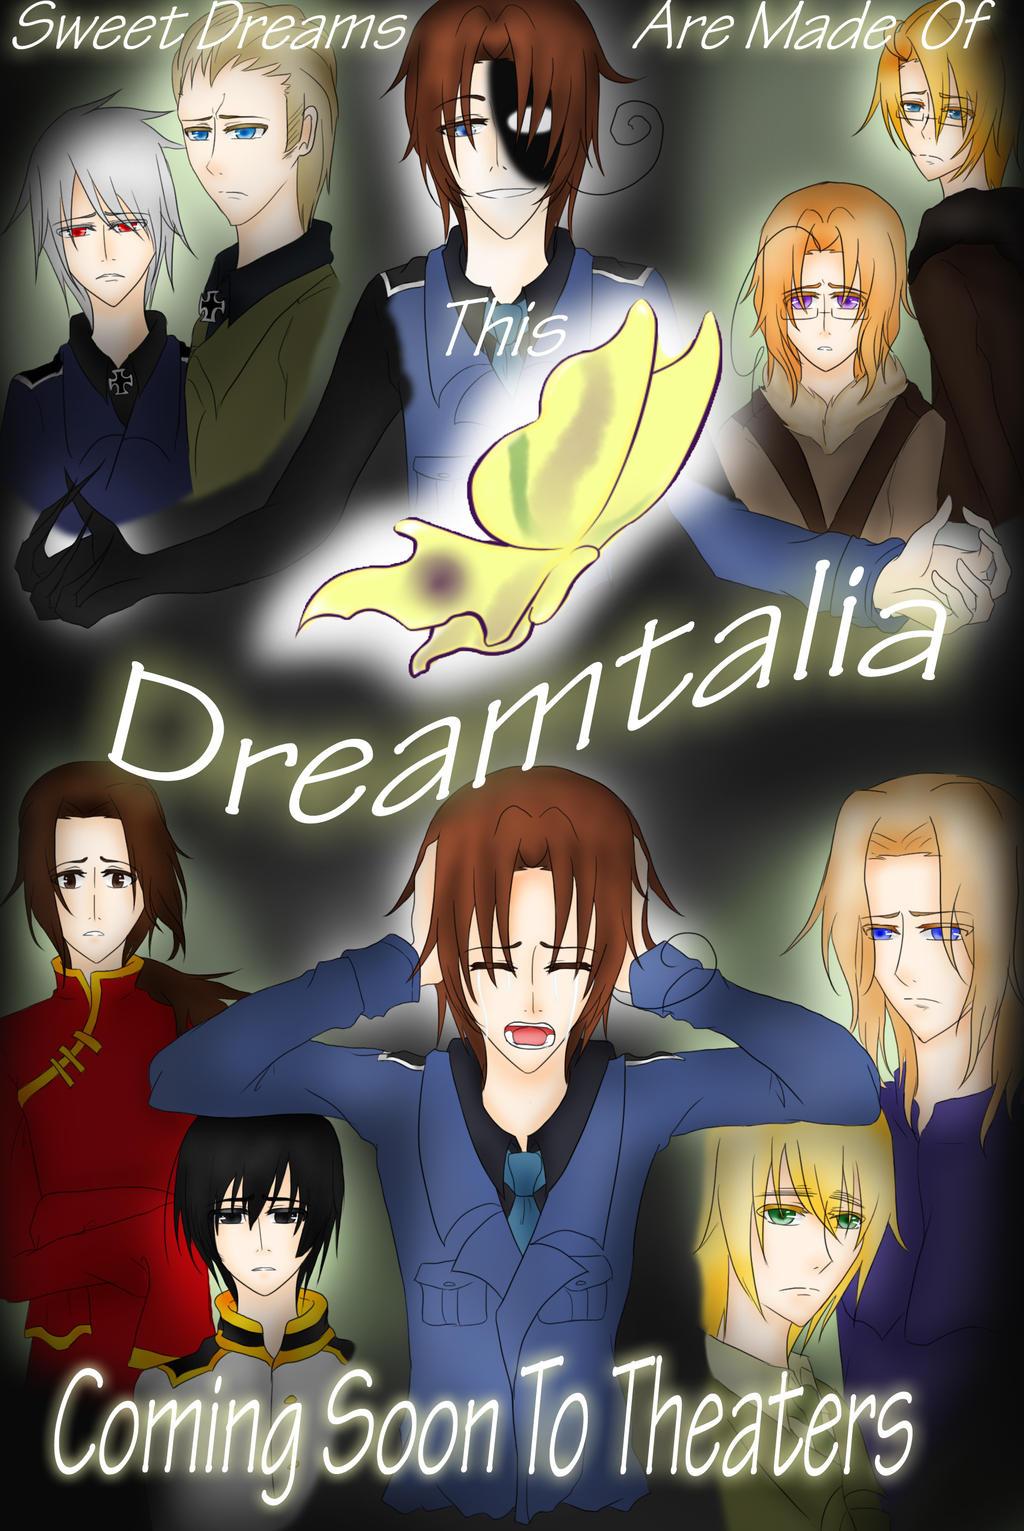 Dreamtalia The Movie by Kyun-Sein